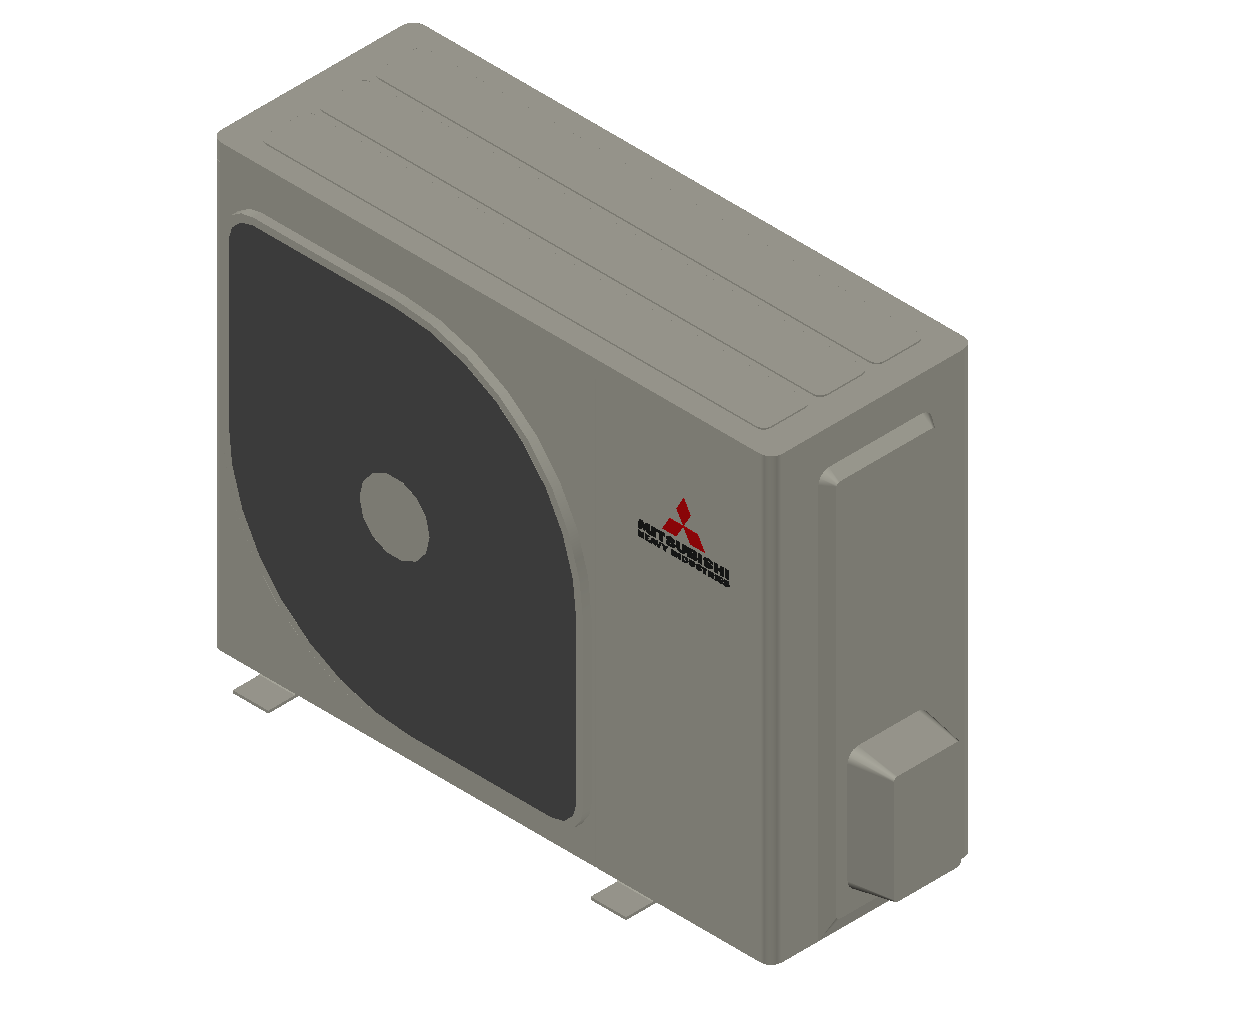 HC_Heat Pump_MEPcontent_Mitsubishi Heavy Industries_PAC-RAC_SRC35ZSX-W_INT-EN.dwg